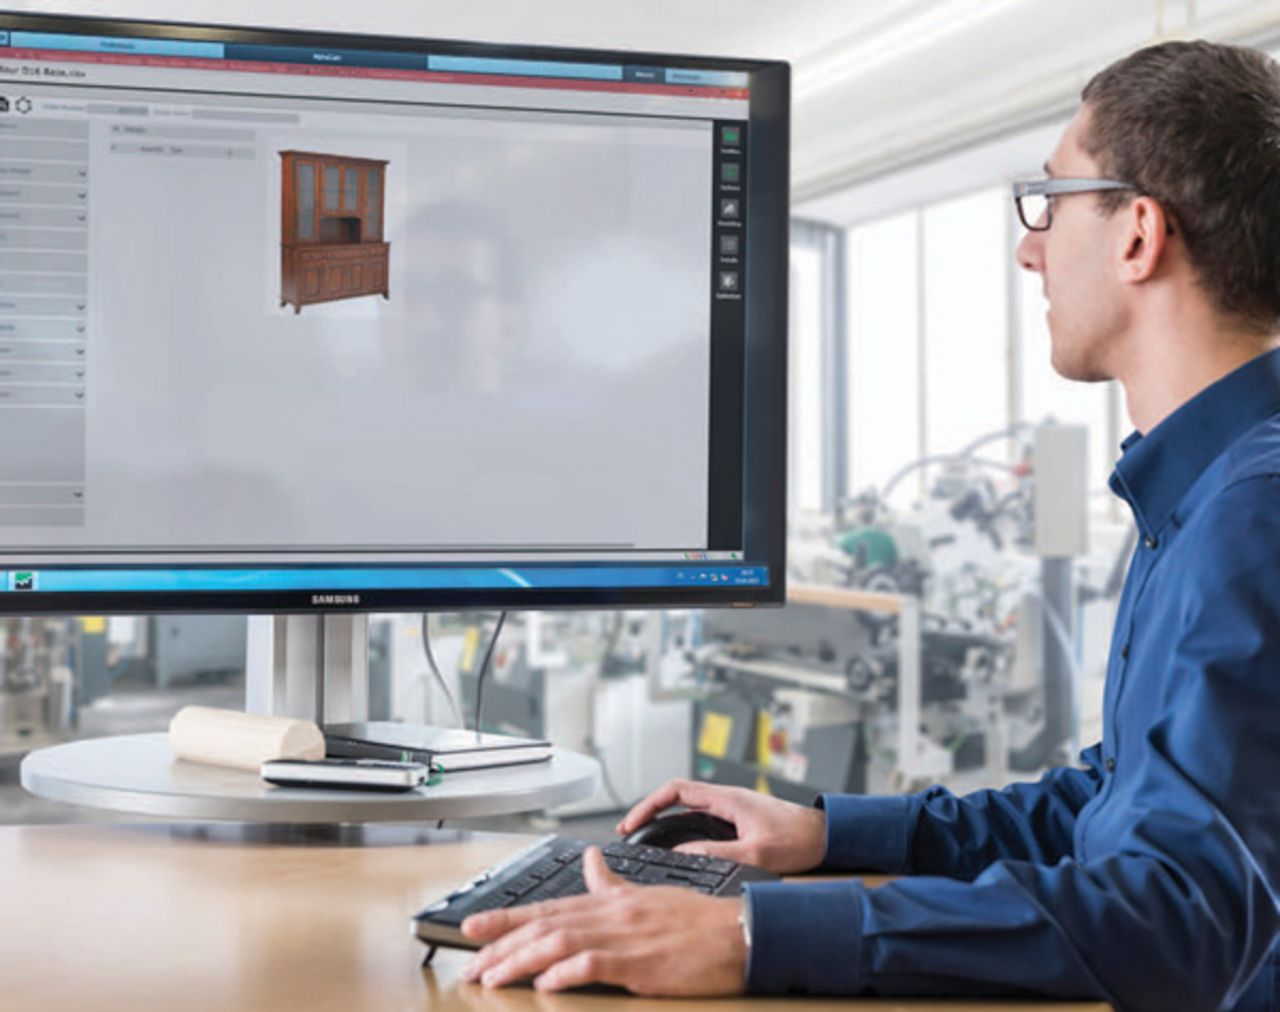 Csm Envision Software Bb Ae De on Weinig Parts